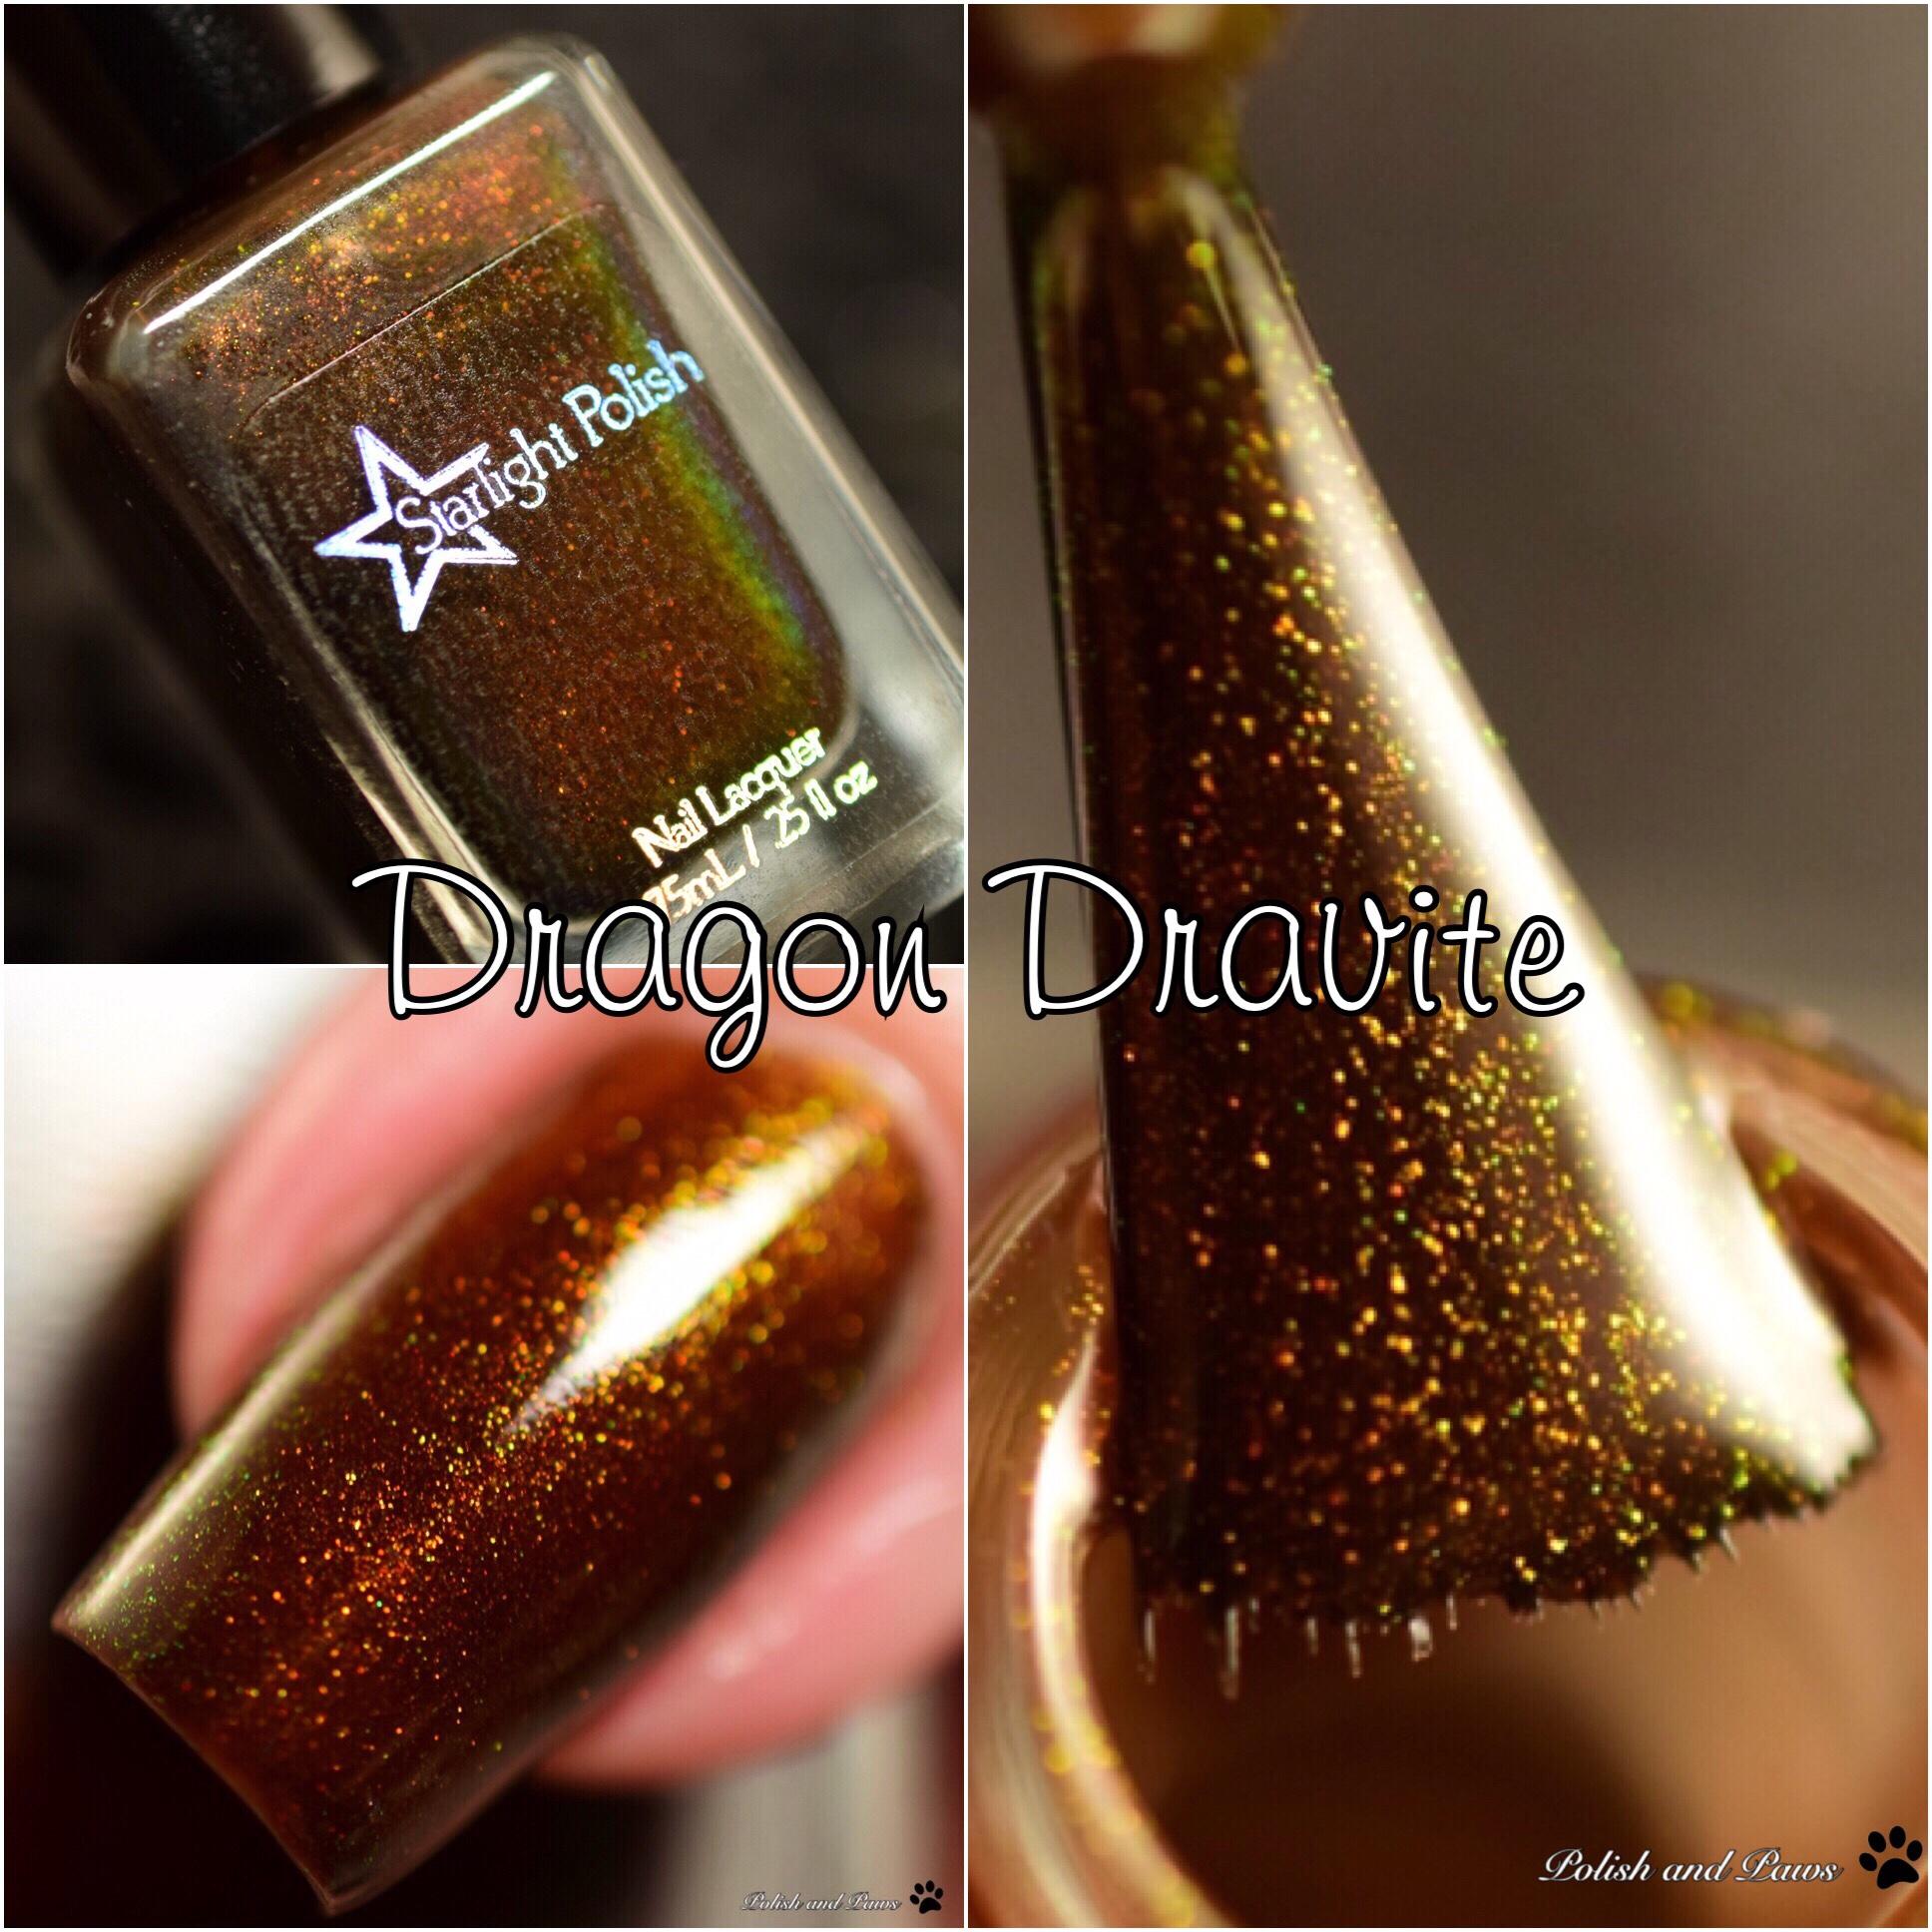 Starlight Polish Dragon Dravite